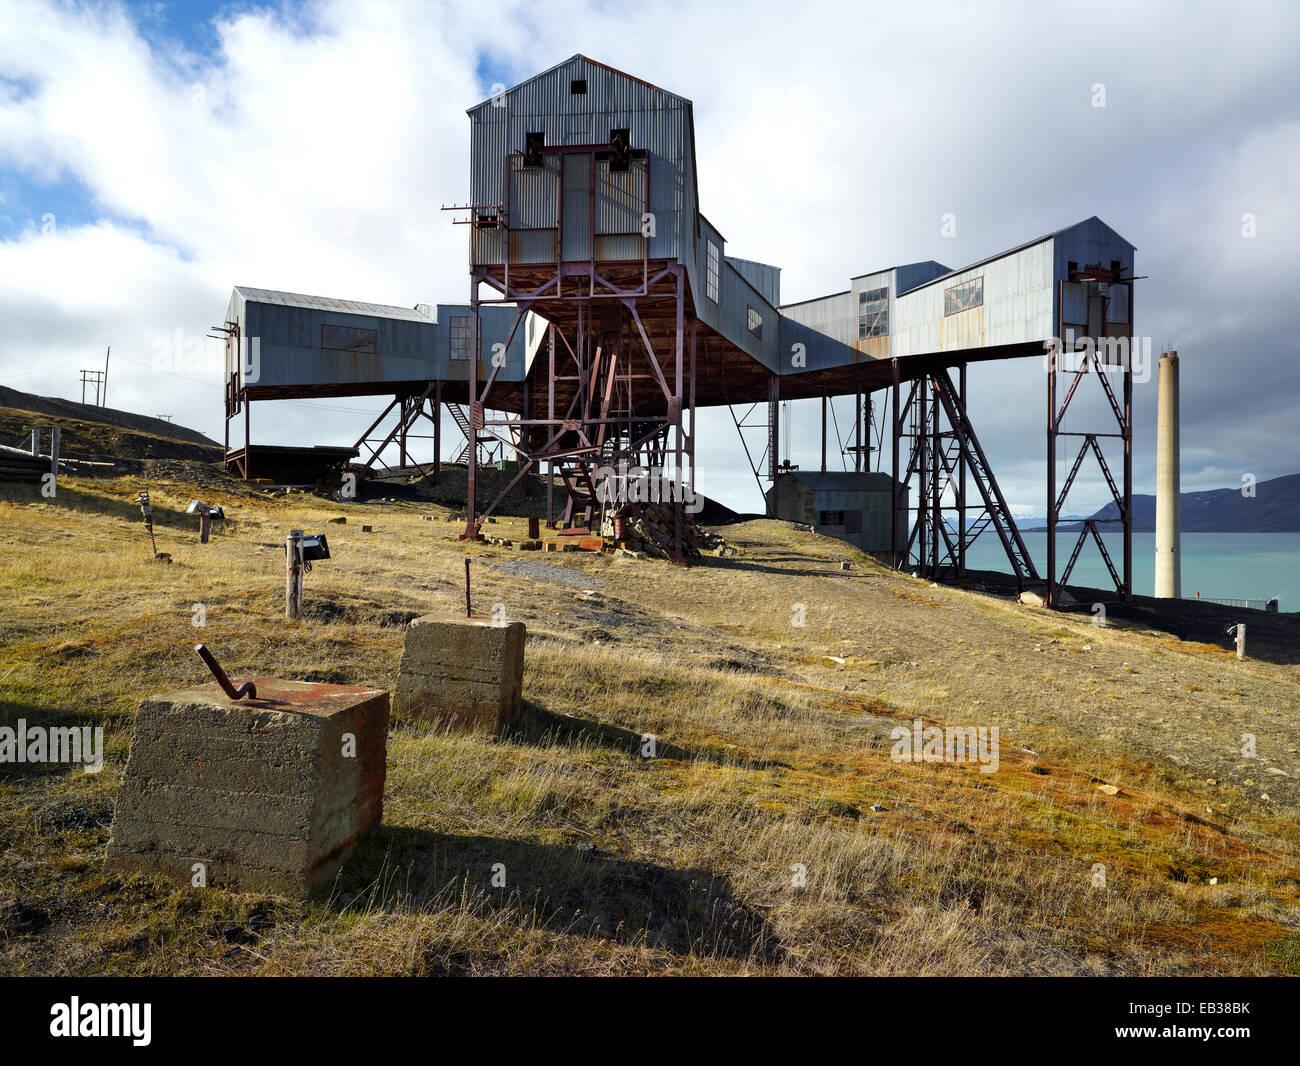 Old coal mine, Longyearbyen, Spitsbergen Island, Svalbard Archipelago, Svalbard and Jan Mayen, Norway Stock Photo